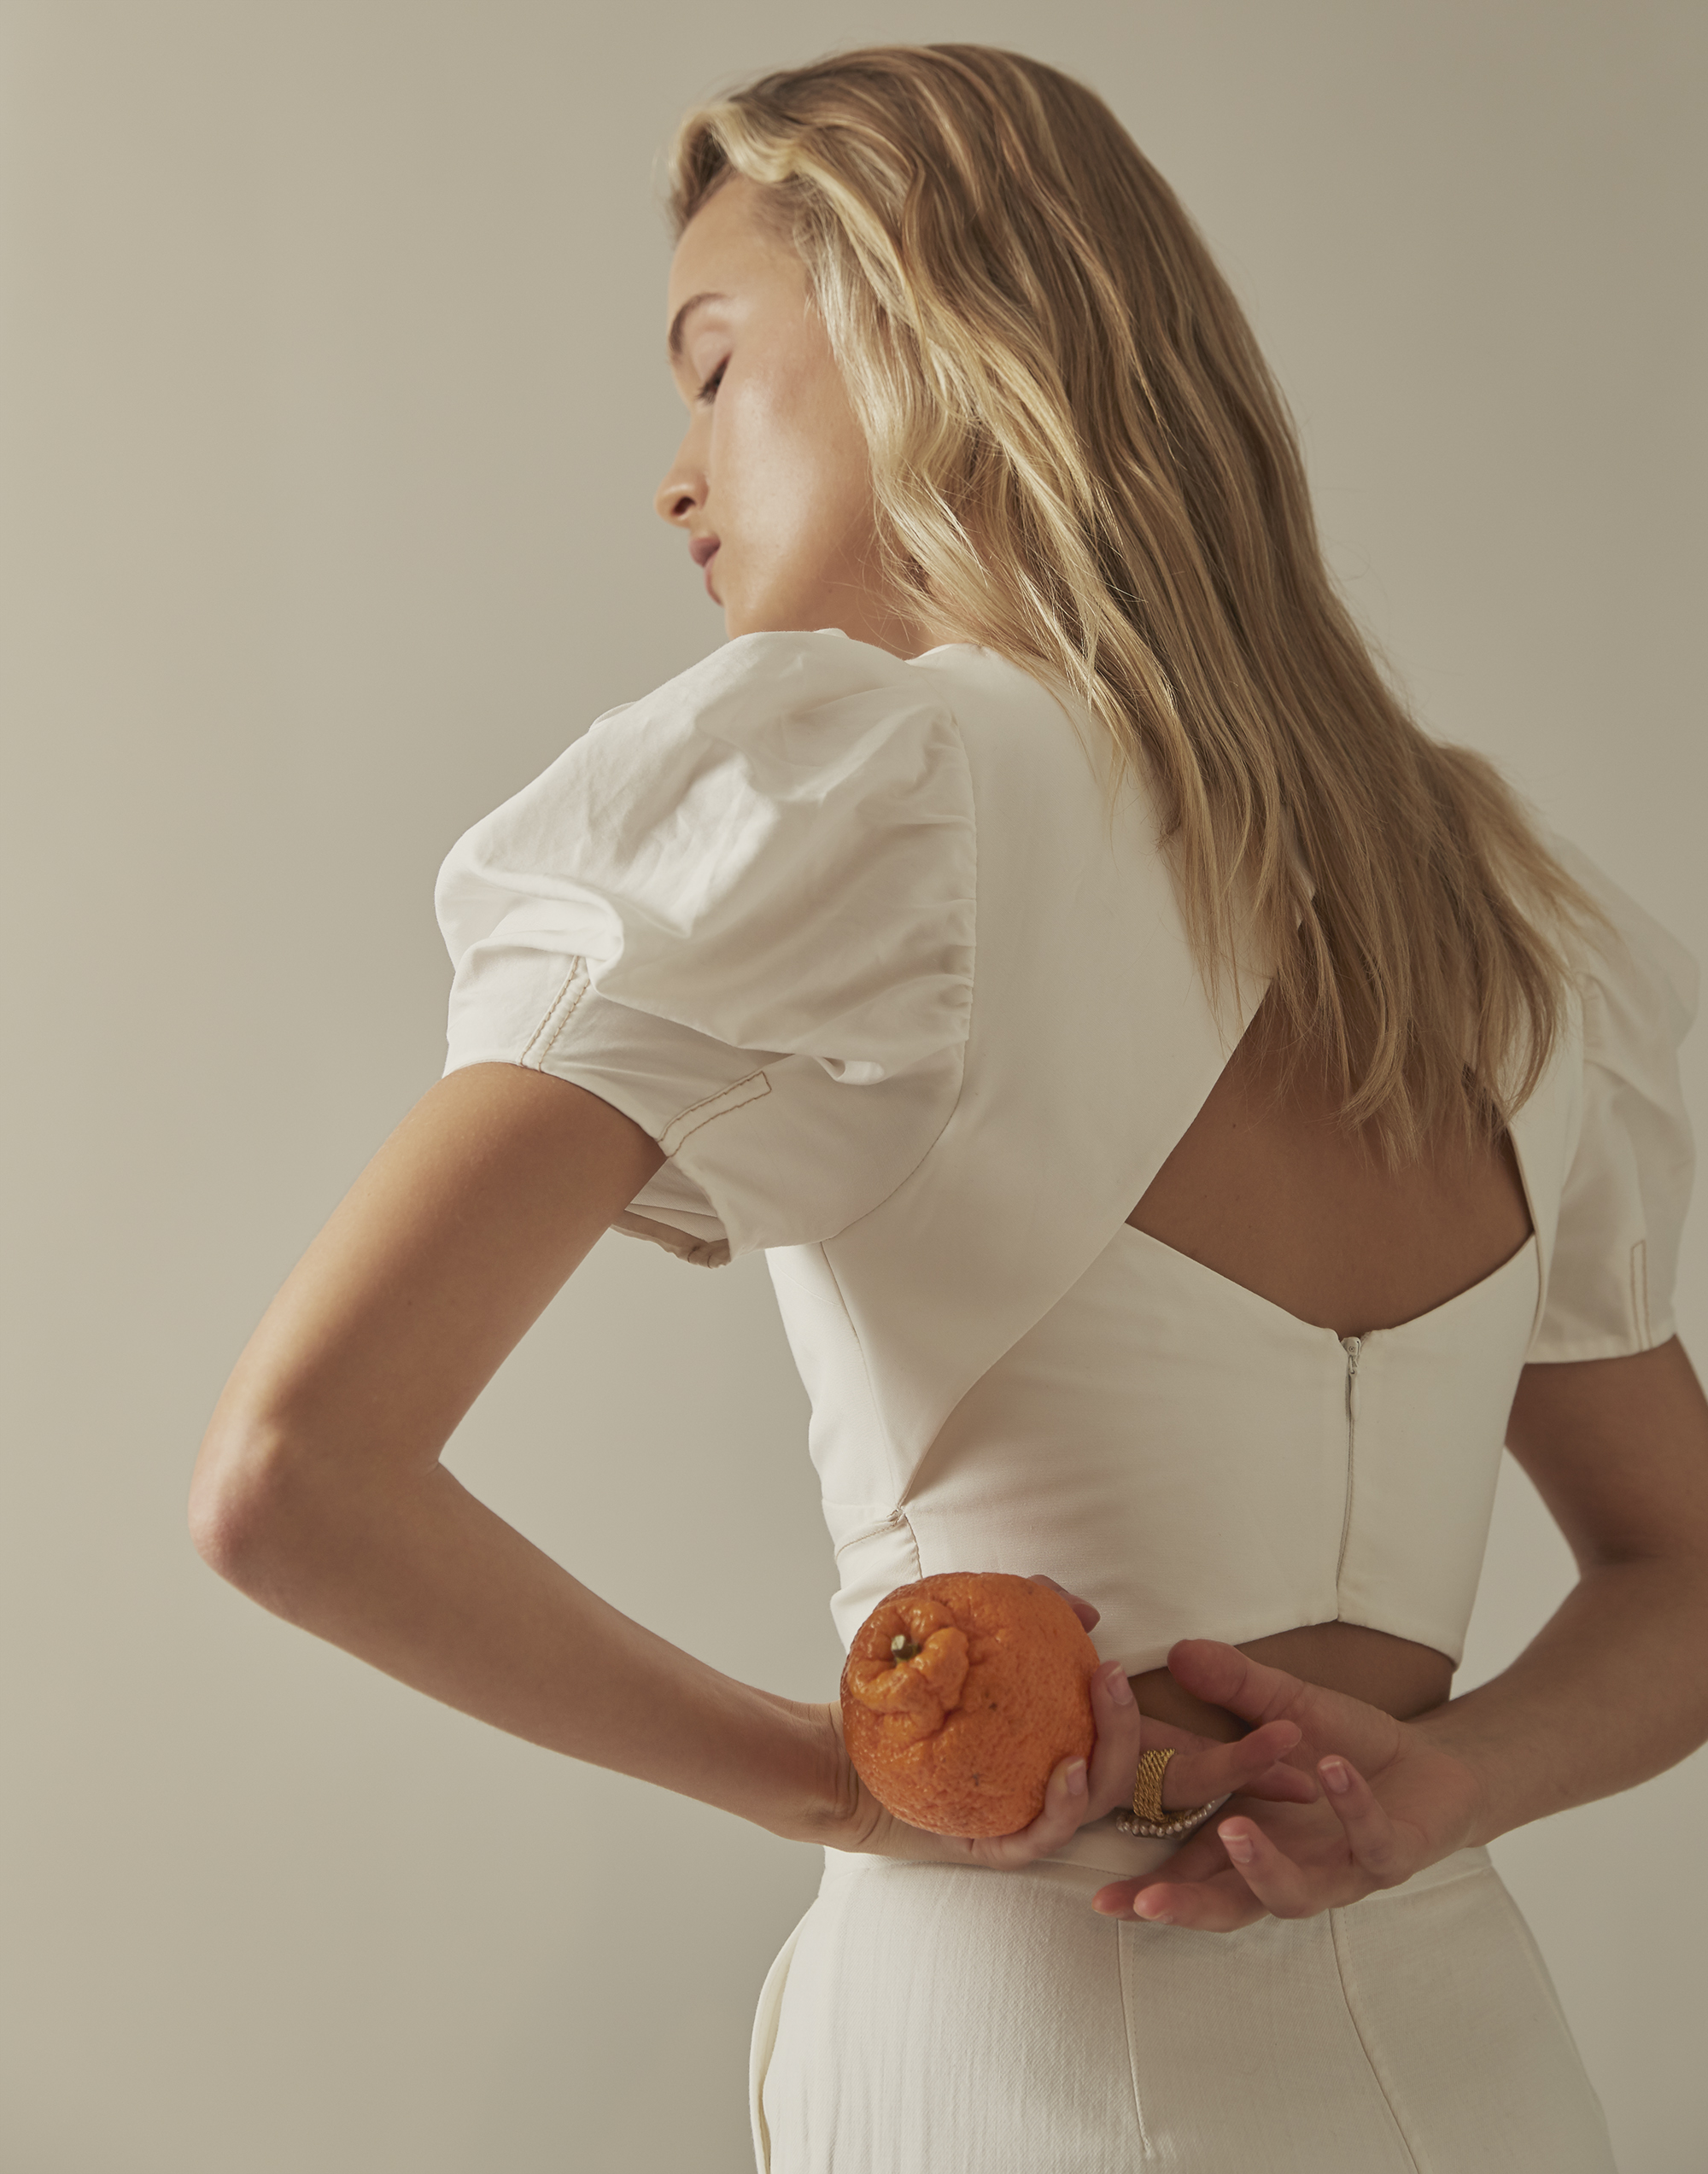 Esti wears Rachel Gilbert top, pants from Marle and a ring by Elena Kougiainou.